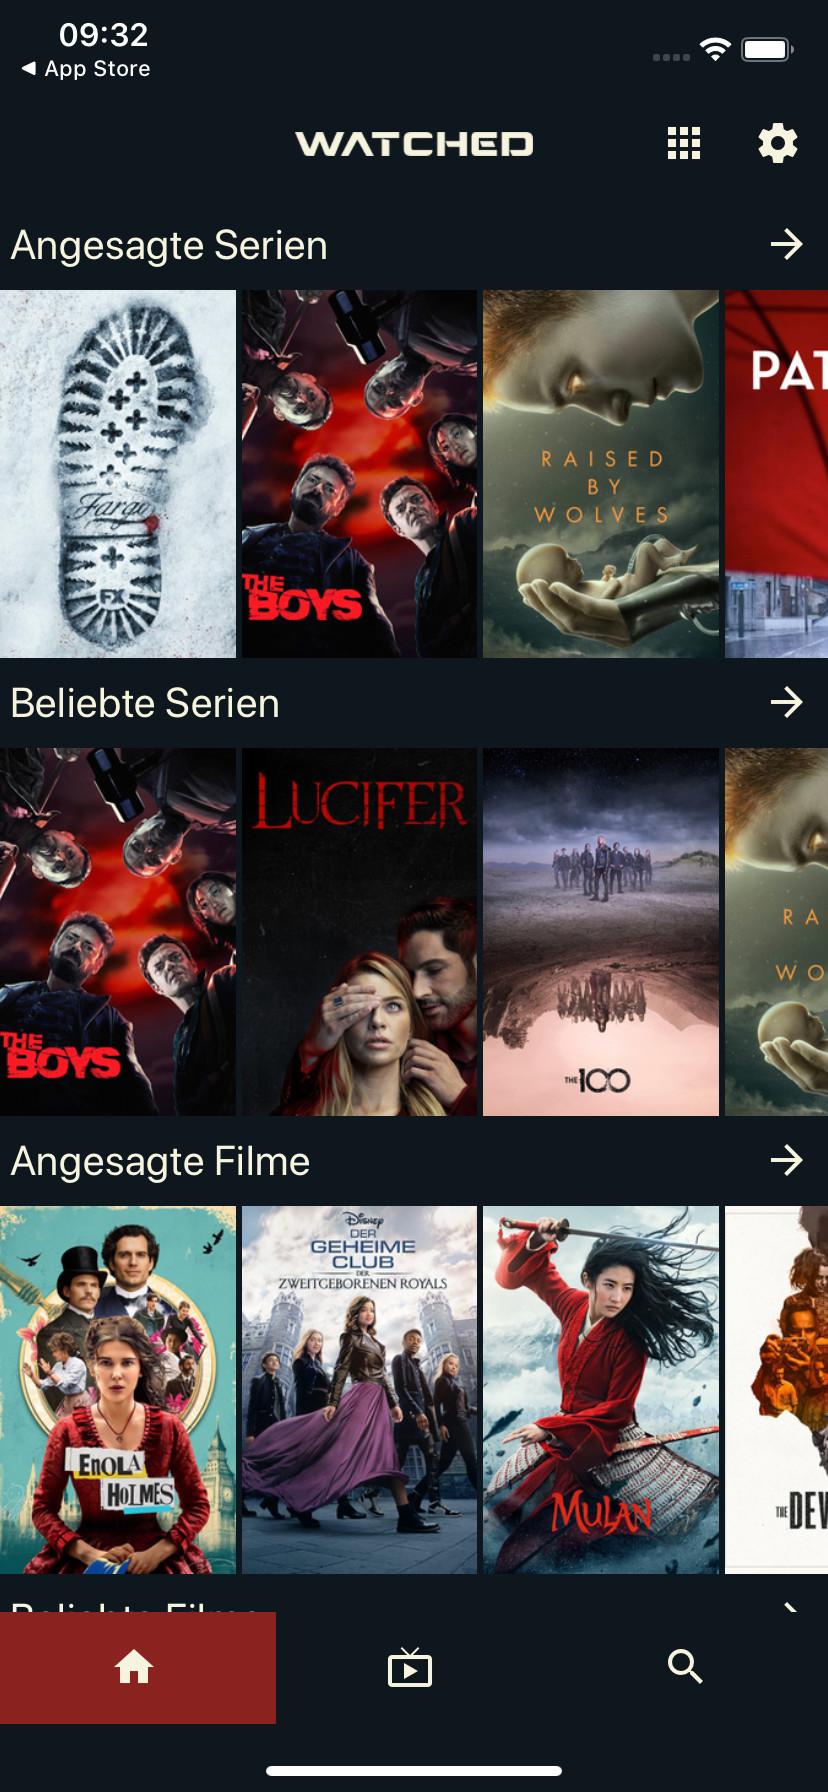 Screenshot 1 - Watched (App für iPhone & iPad)